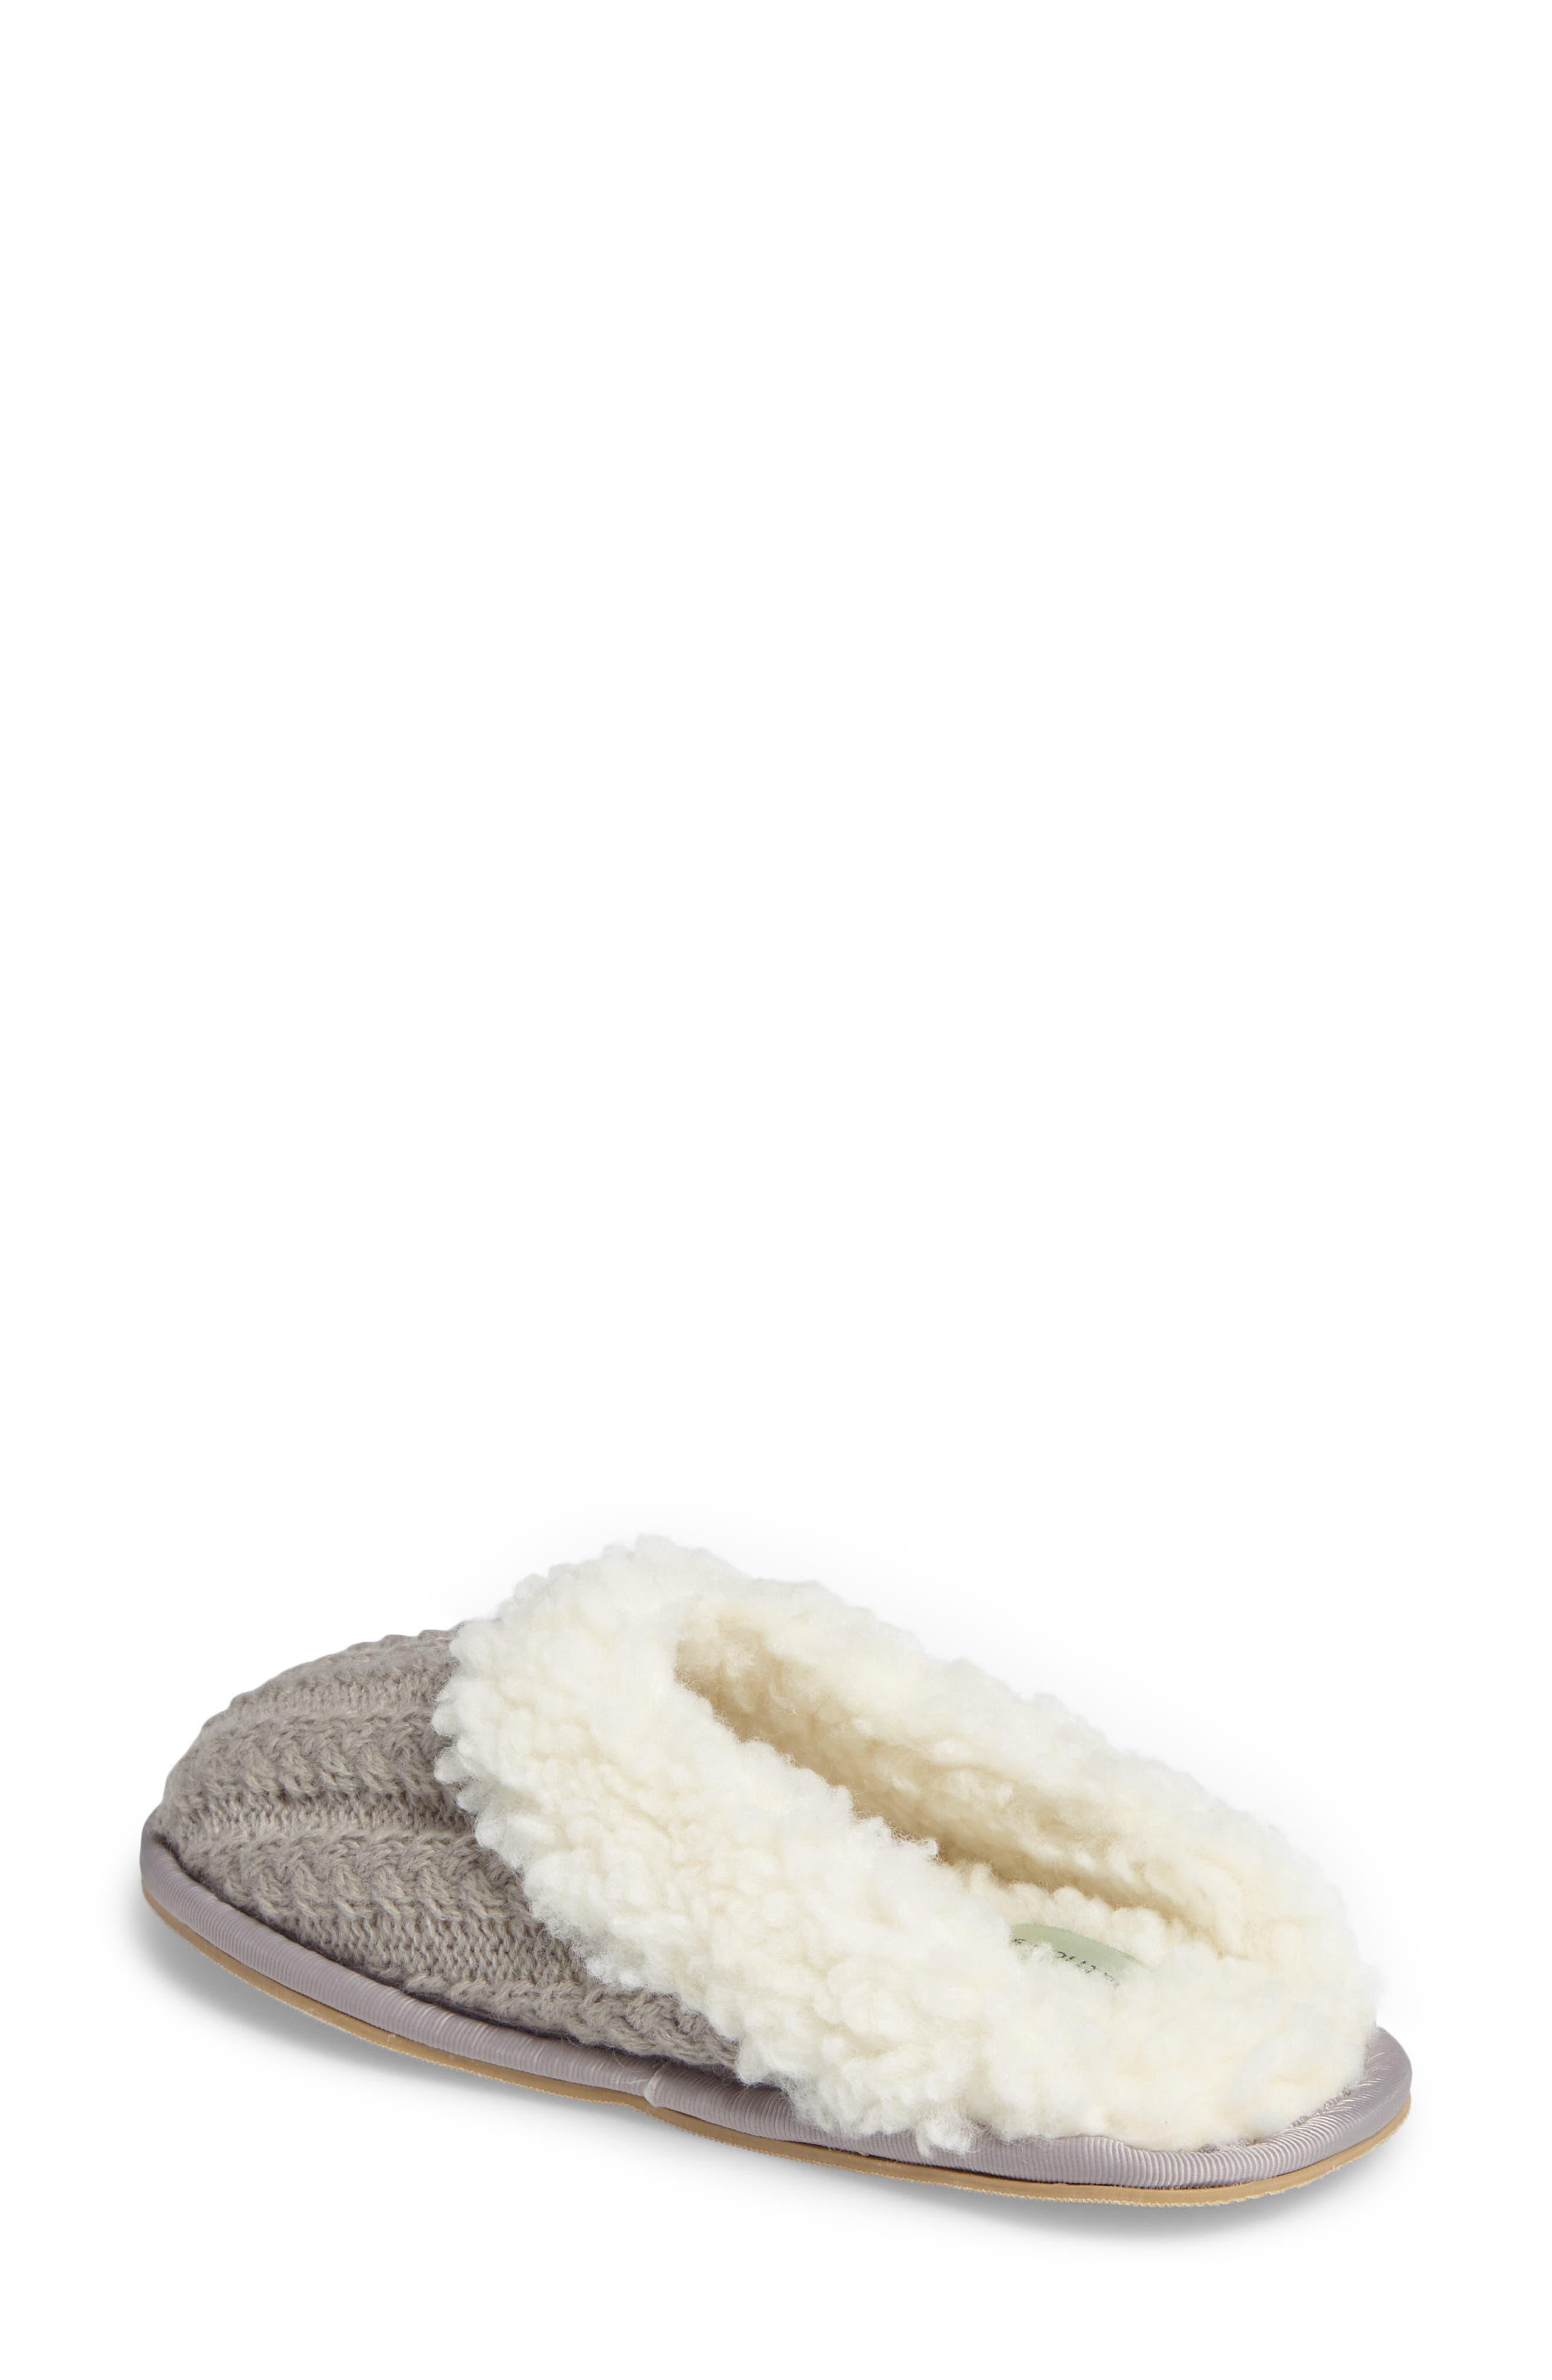 Celia Cable Knit Slipper,                             Alternate thumbnail 2, color,                             Grey Fabric